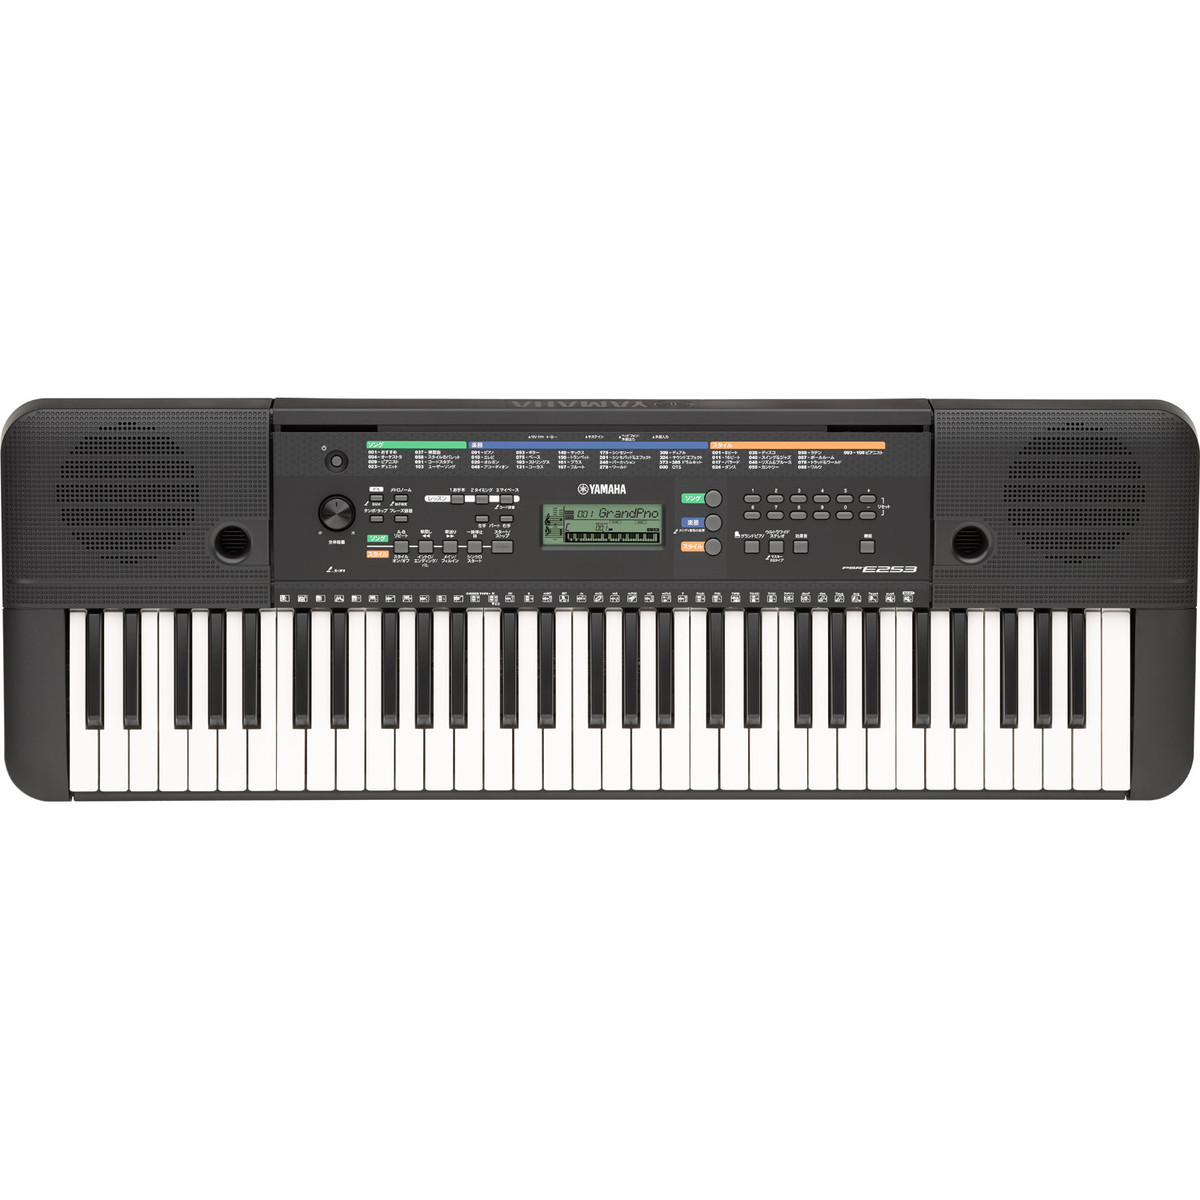 Yamaha Keyboard Backing Tracks